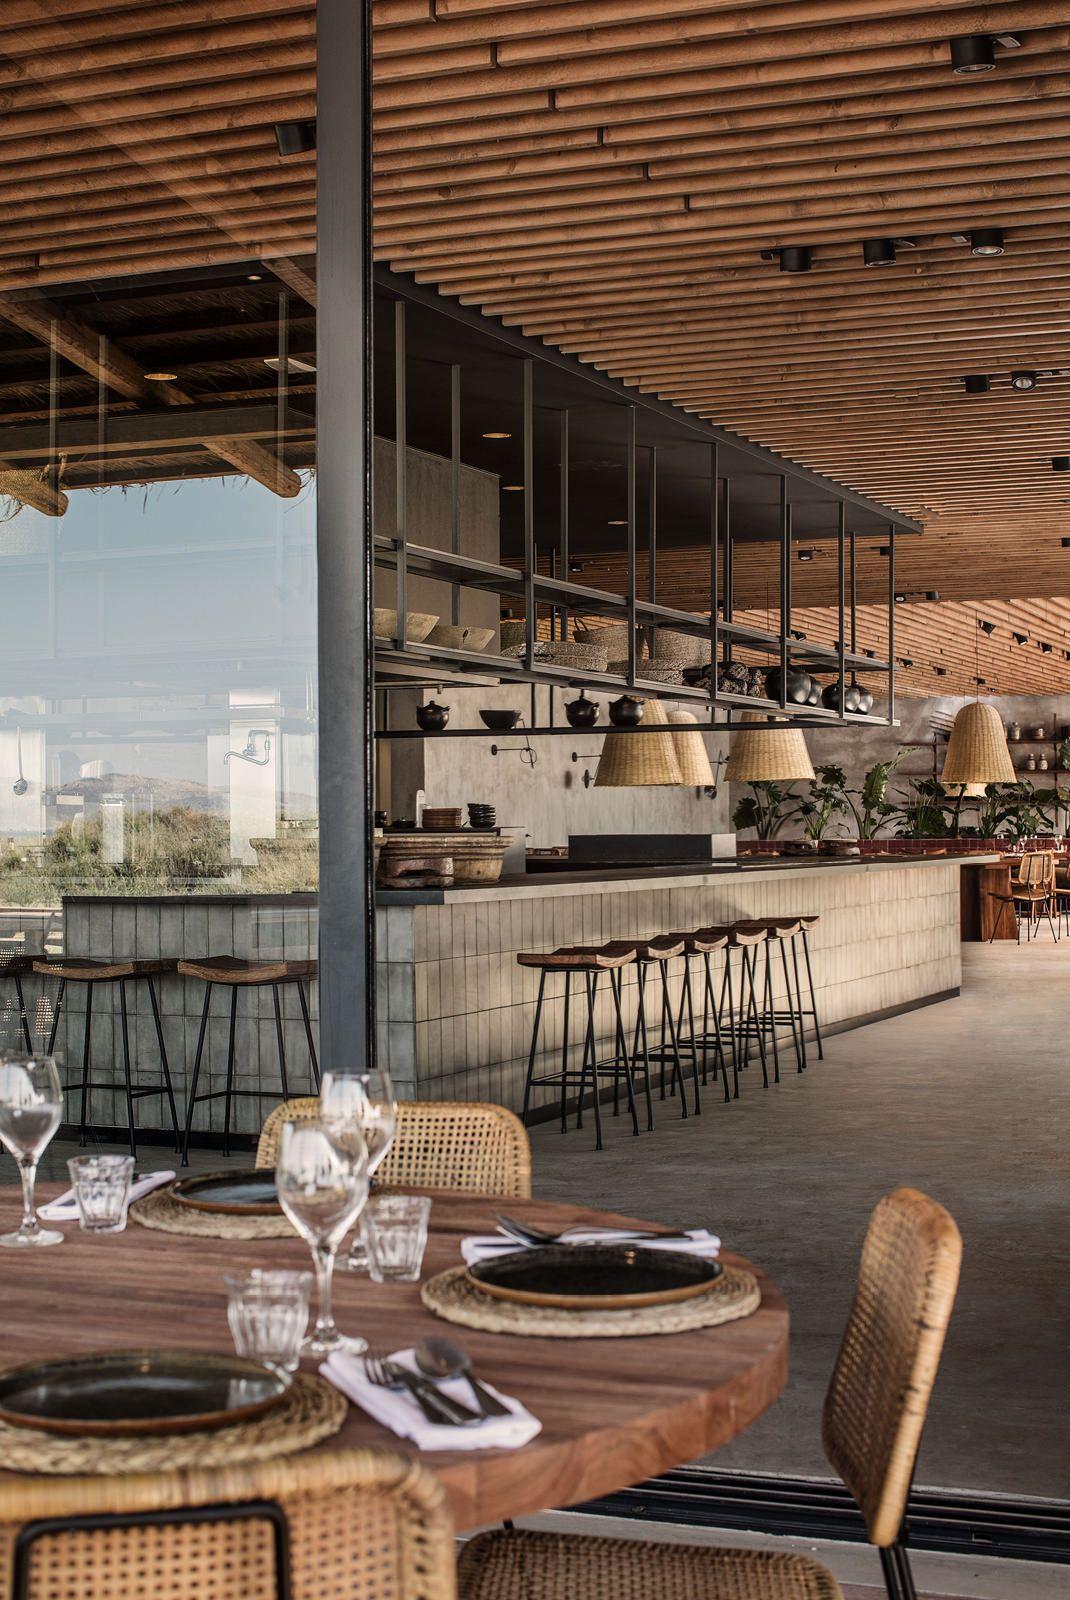 Casa Cook Kos Dwell In 2018 Pinterest Maison Bar Cuisine And